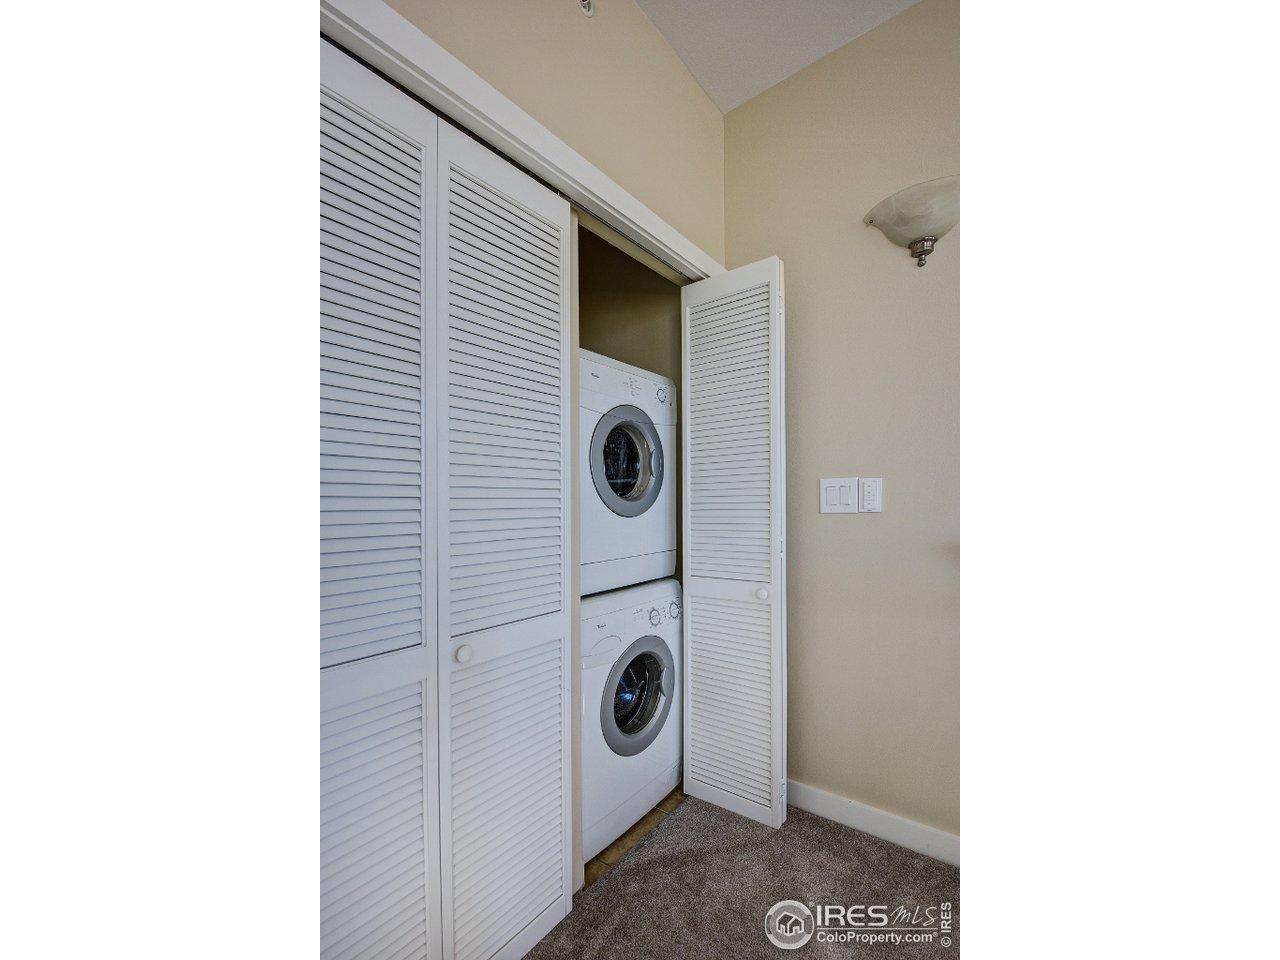 Laundry closet. Washing/dryer stay